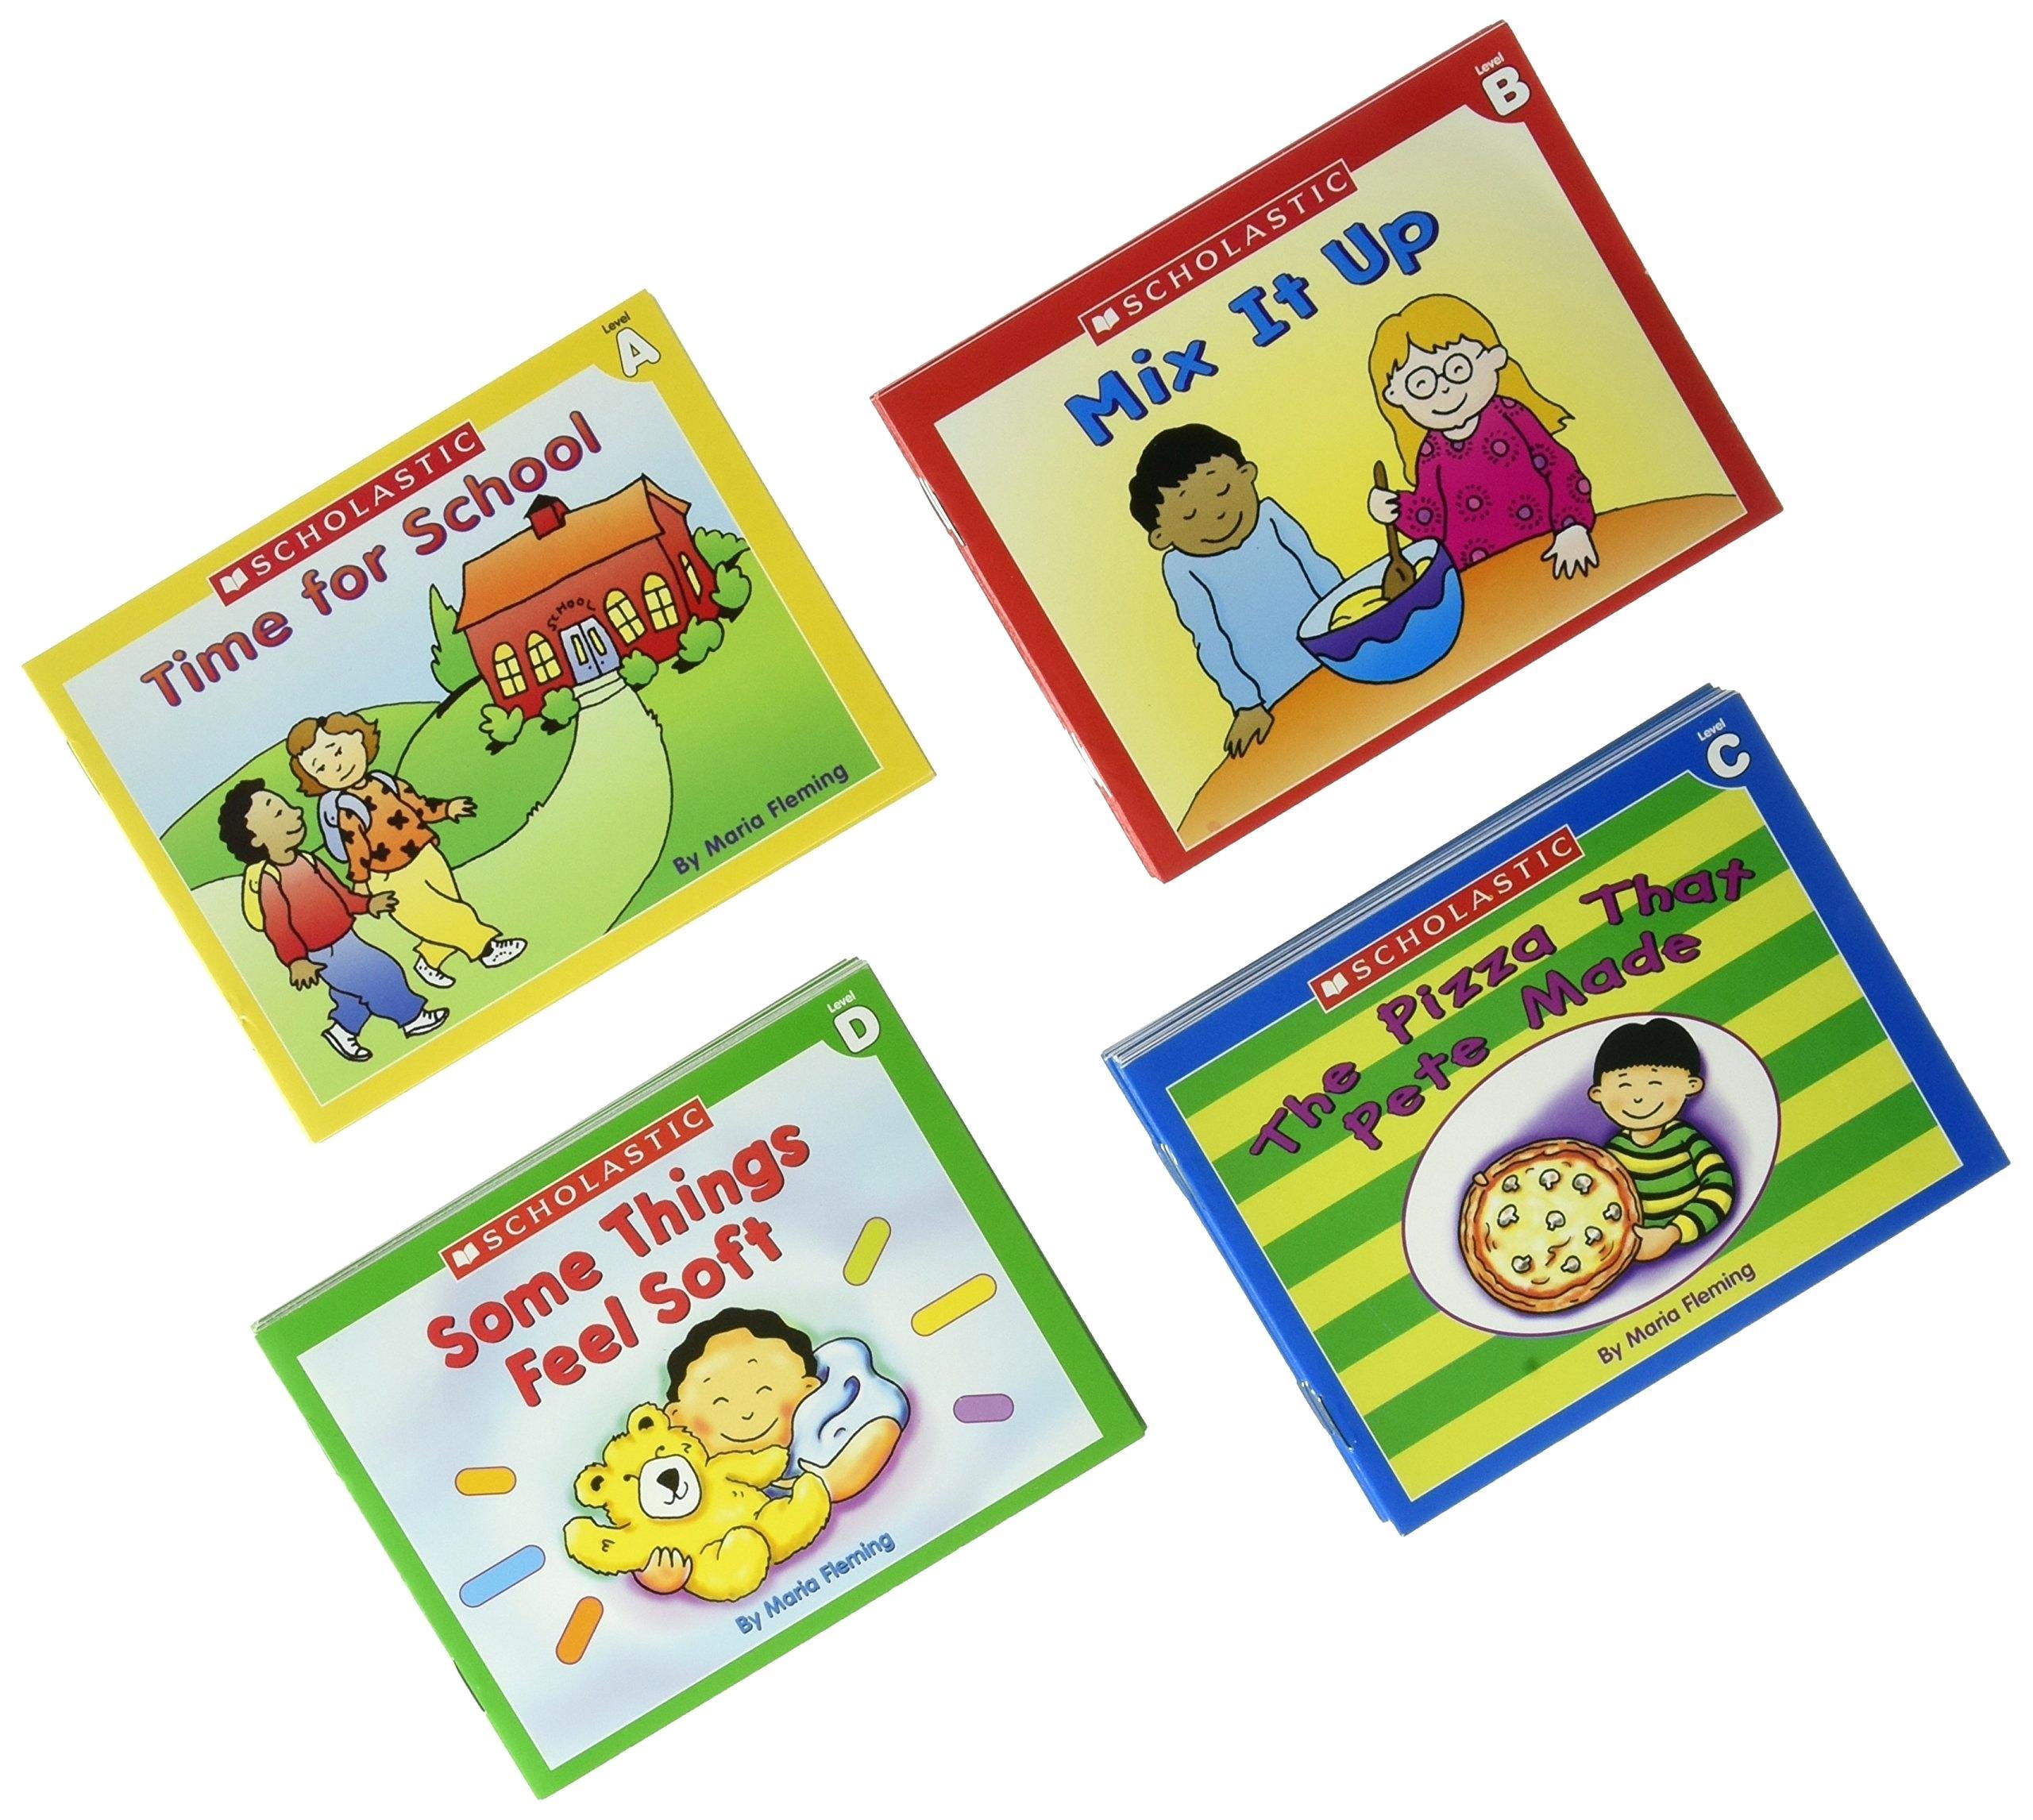 Free Printable Guided Reading Books For Kindergarten - Classy World - Free Printable Leveled Readers For Kindergarten